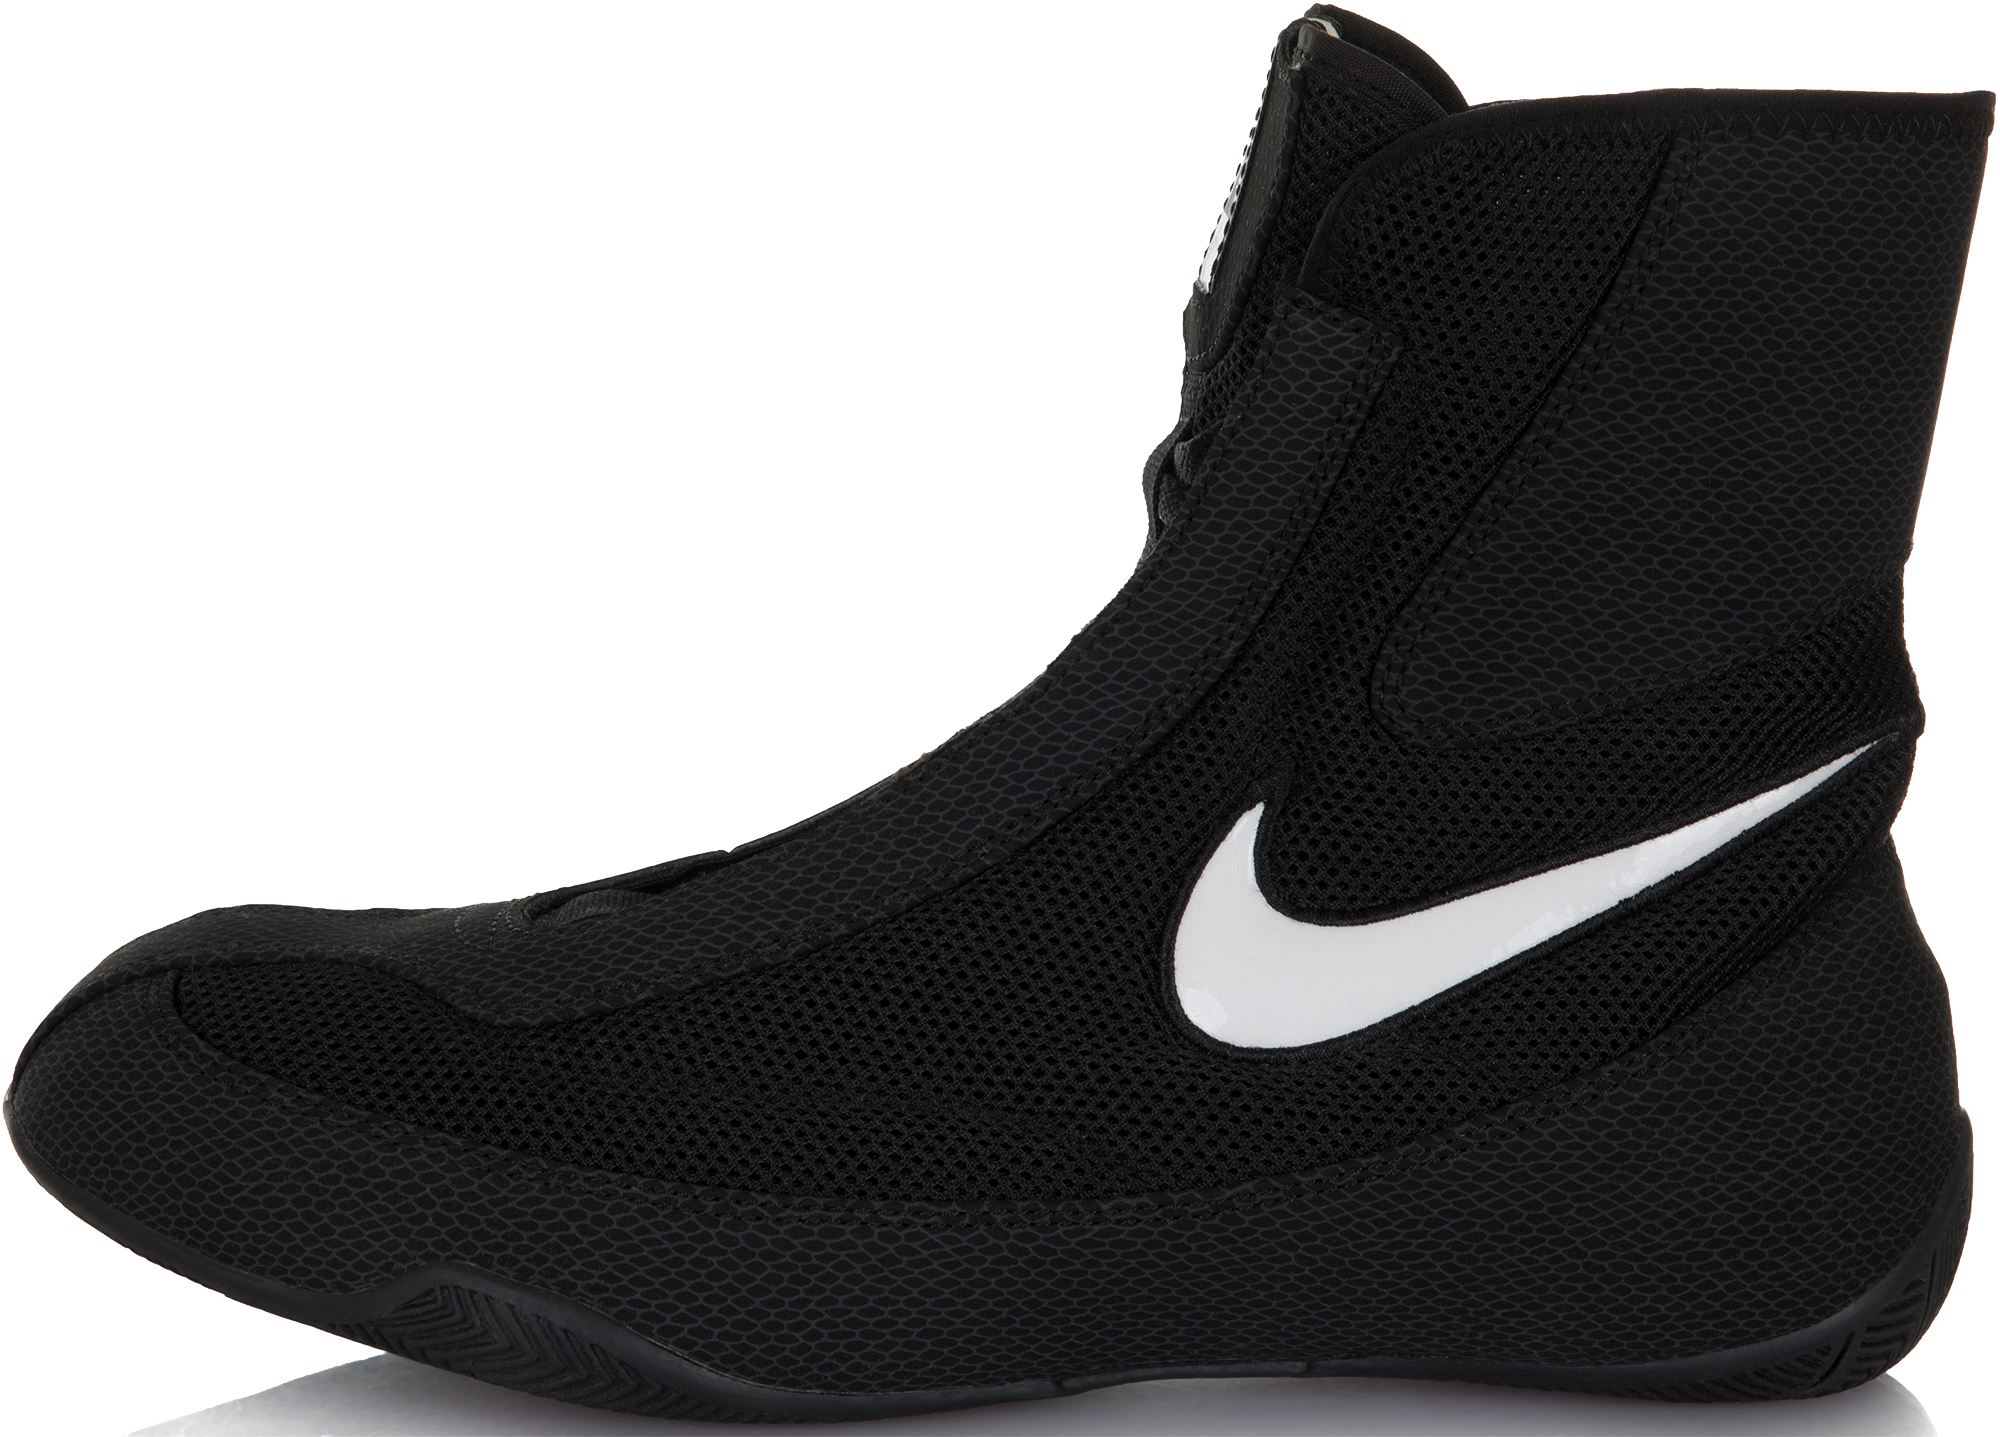 Nike Боксерки мужские Machomai, размер 46